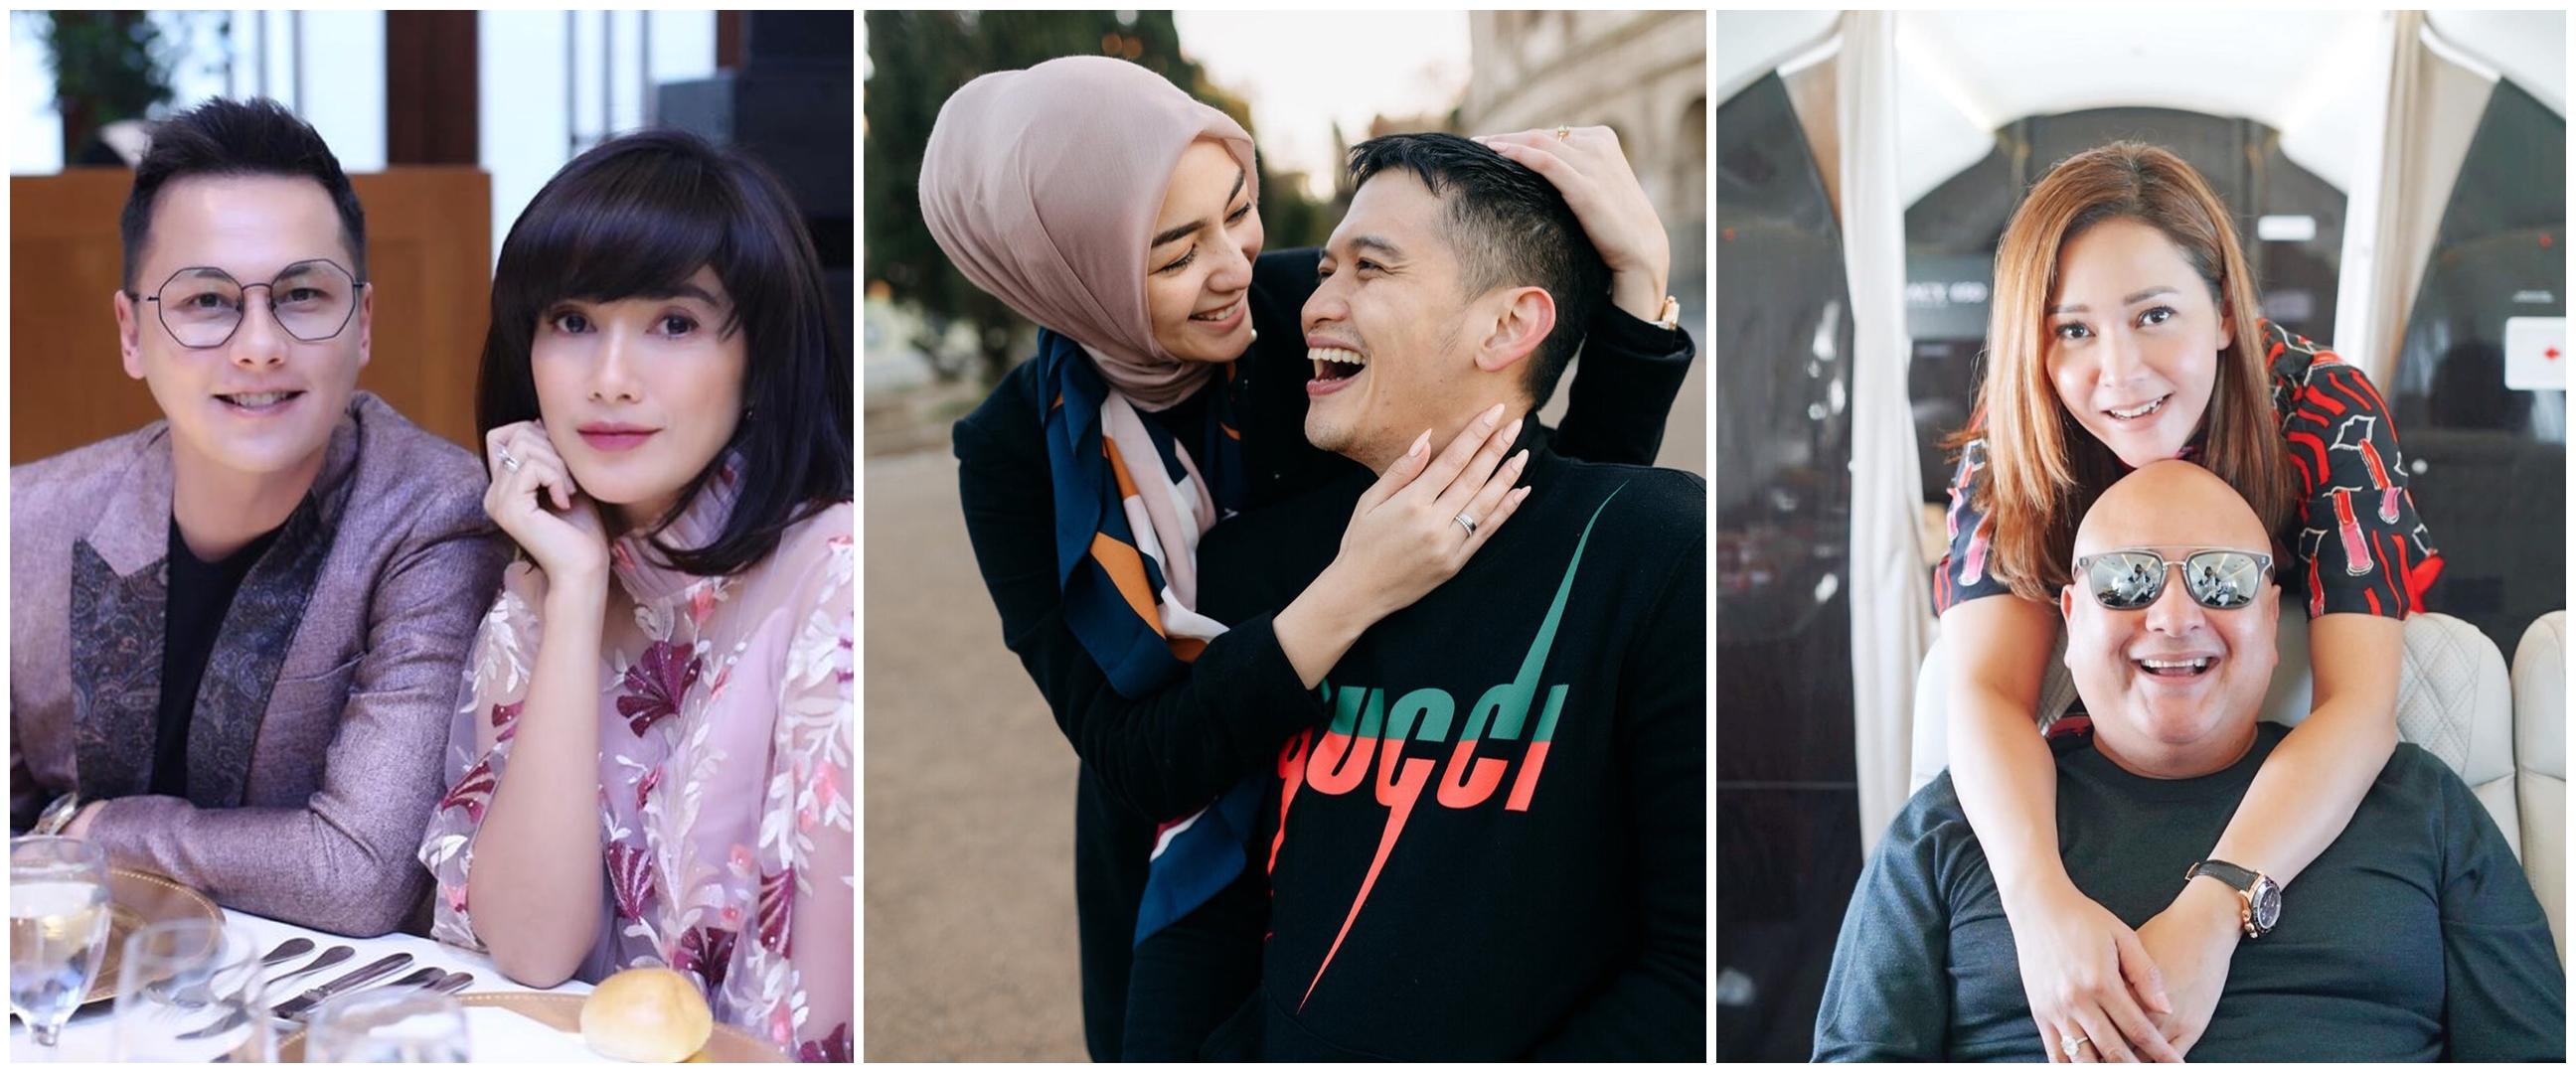 Cara unik 8 seleb ekspresikan romantis untuk pasangannya